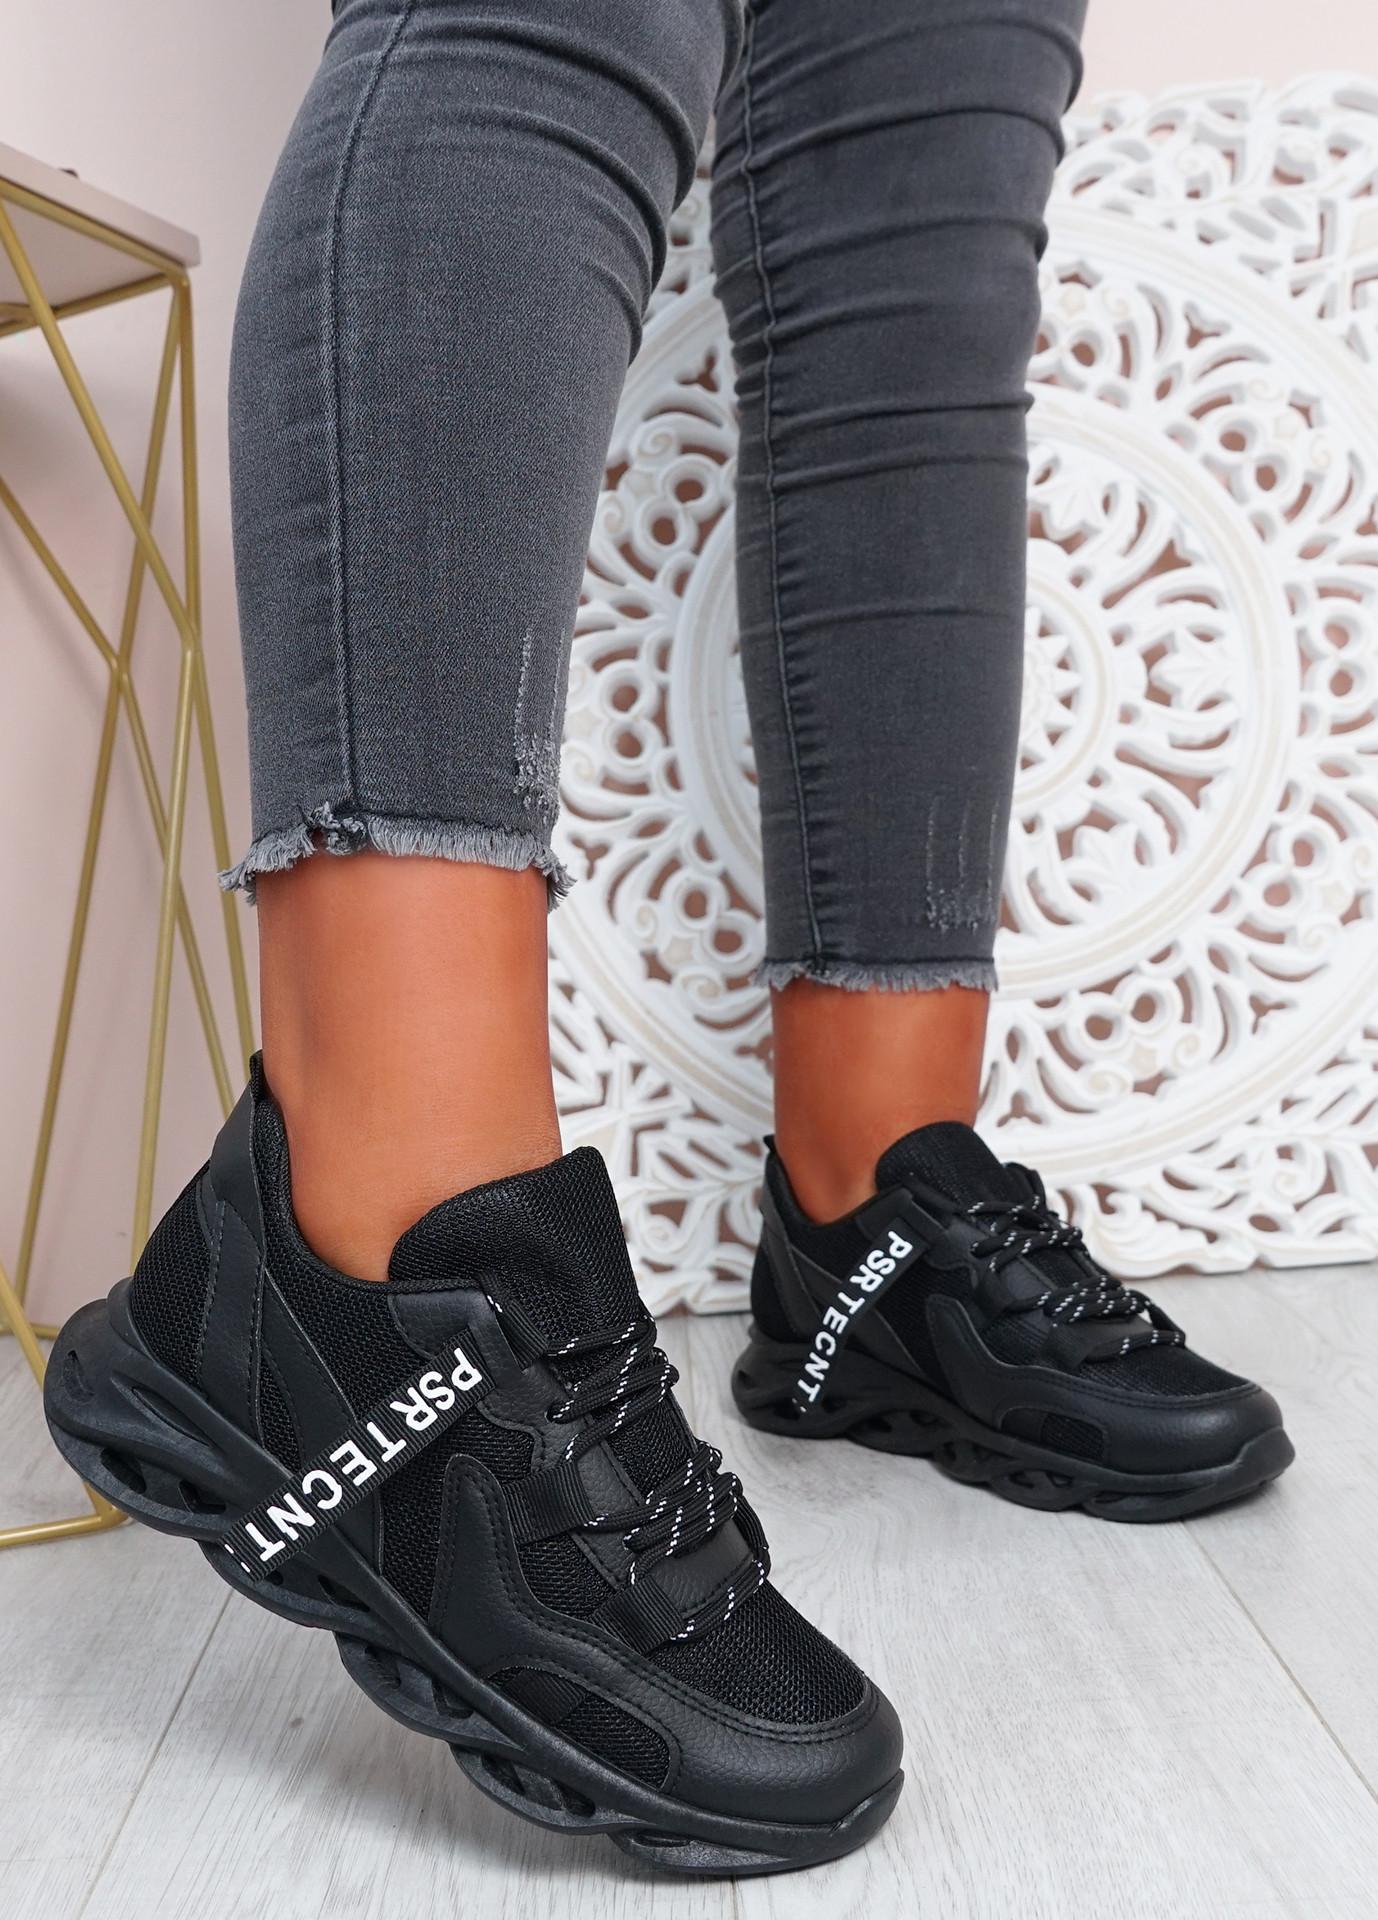 Tia Black Chunky Sport Sneakers